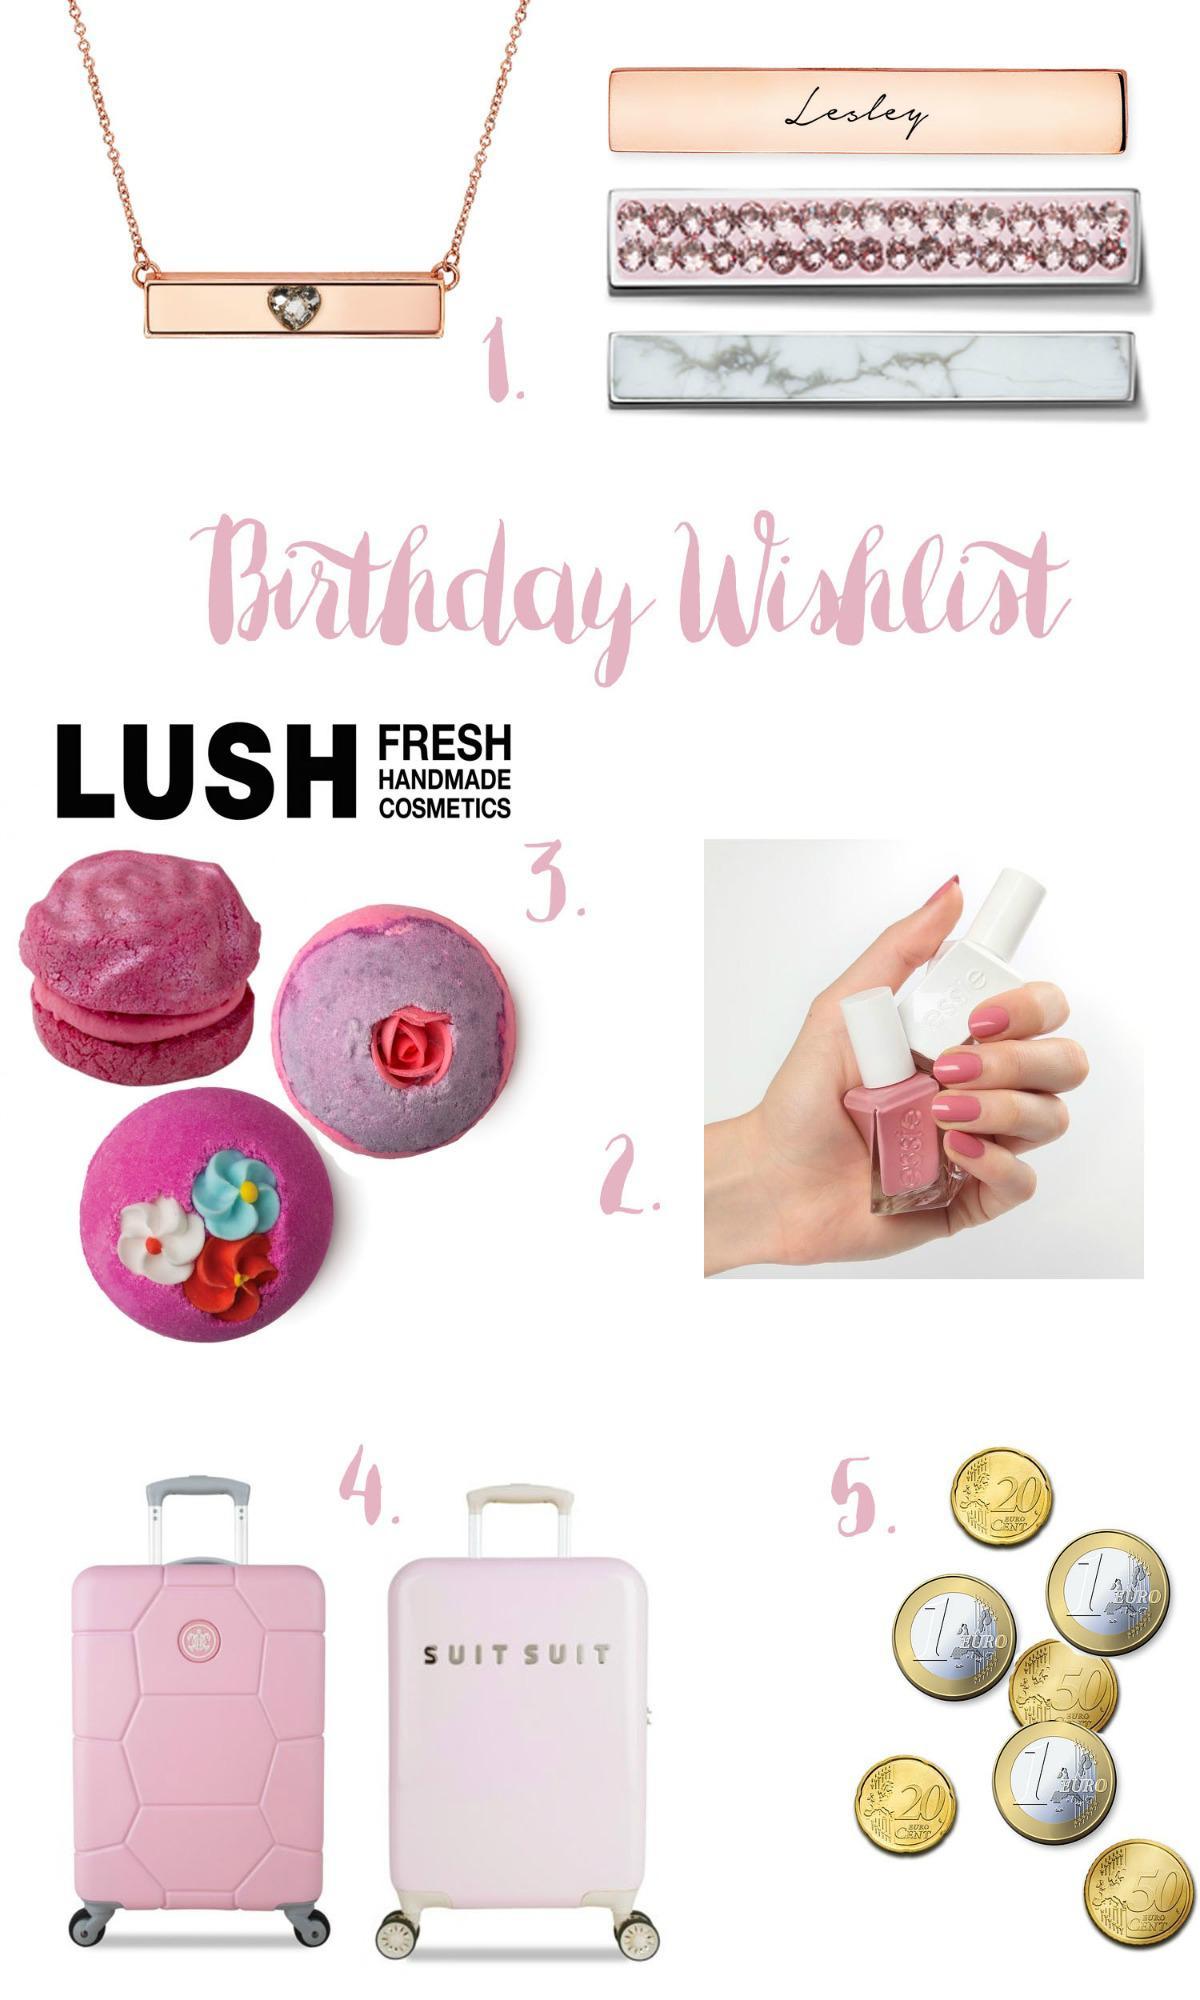 birthday-wishlist-29-jaar